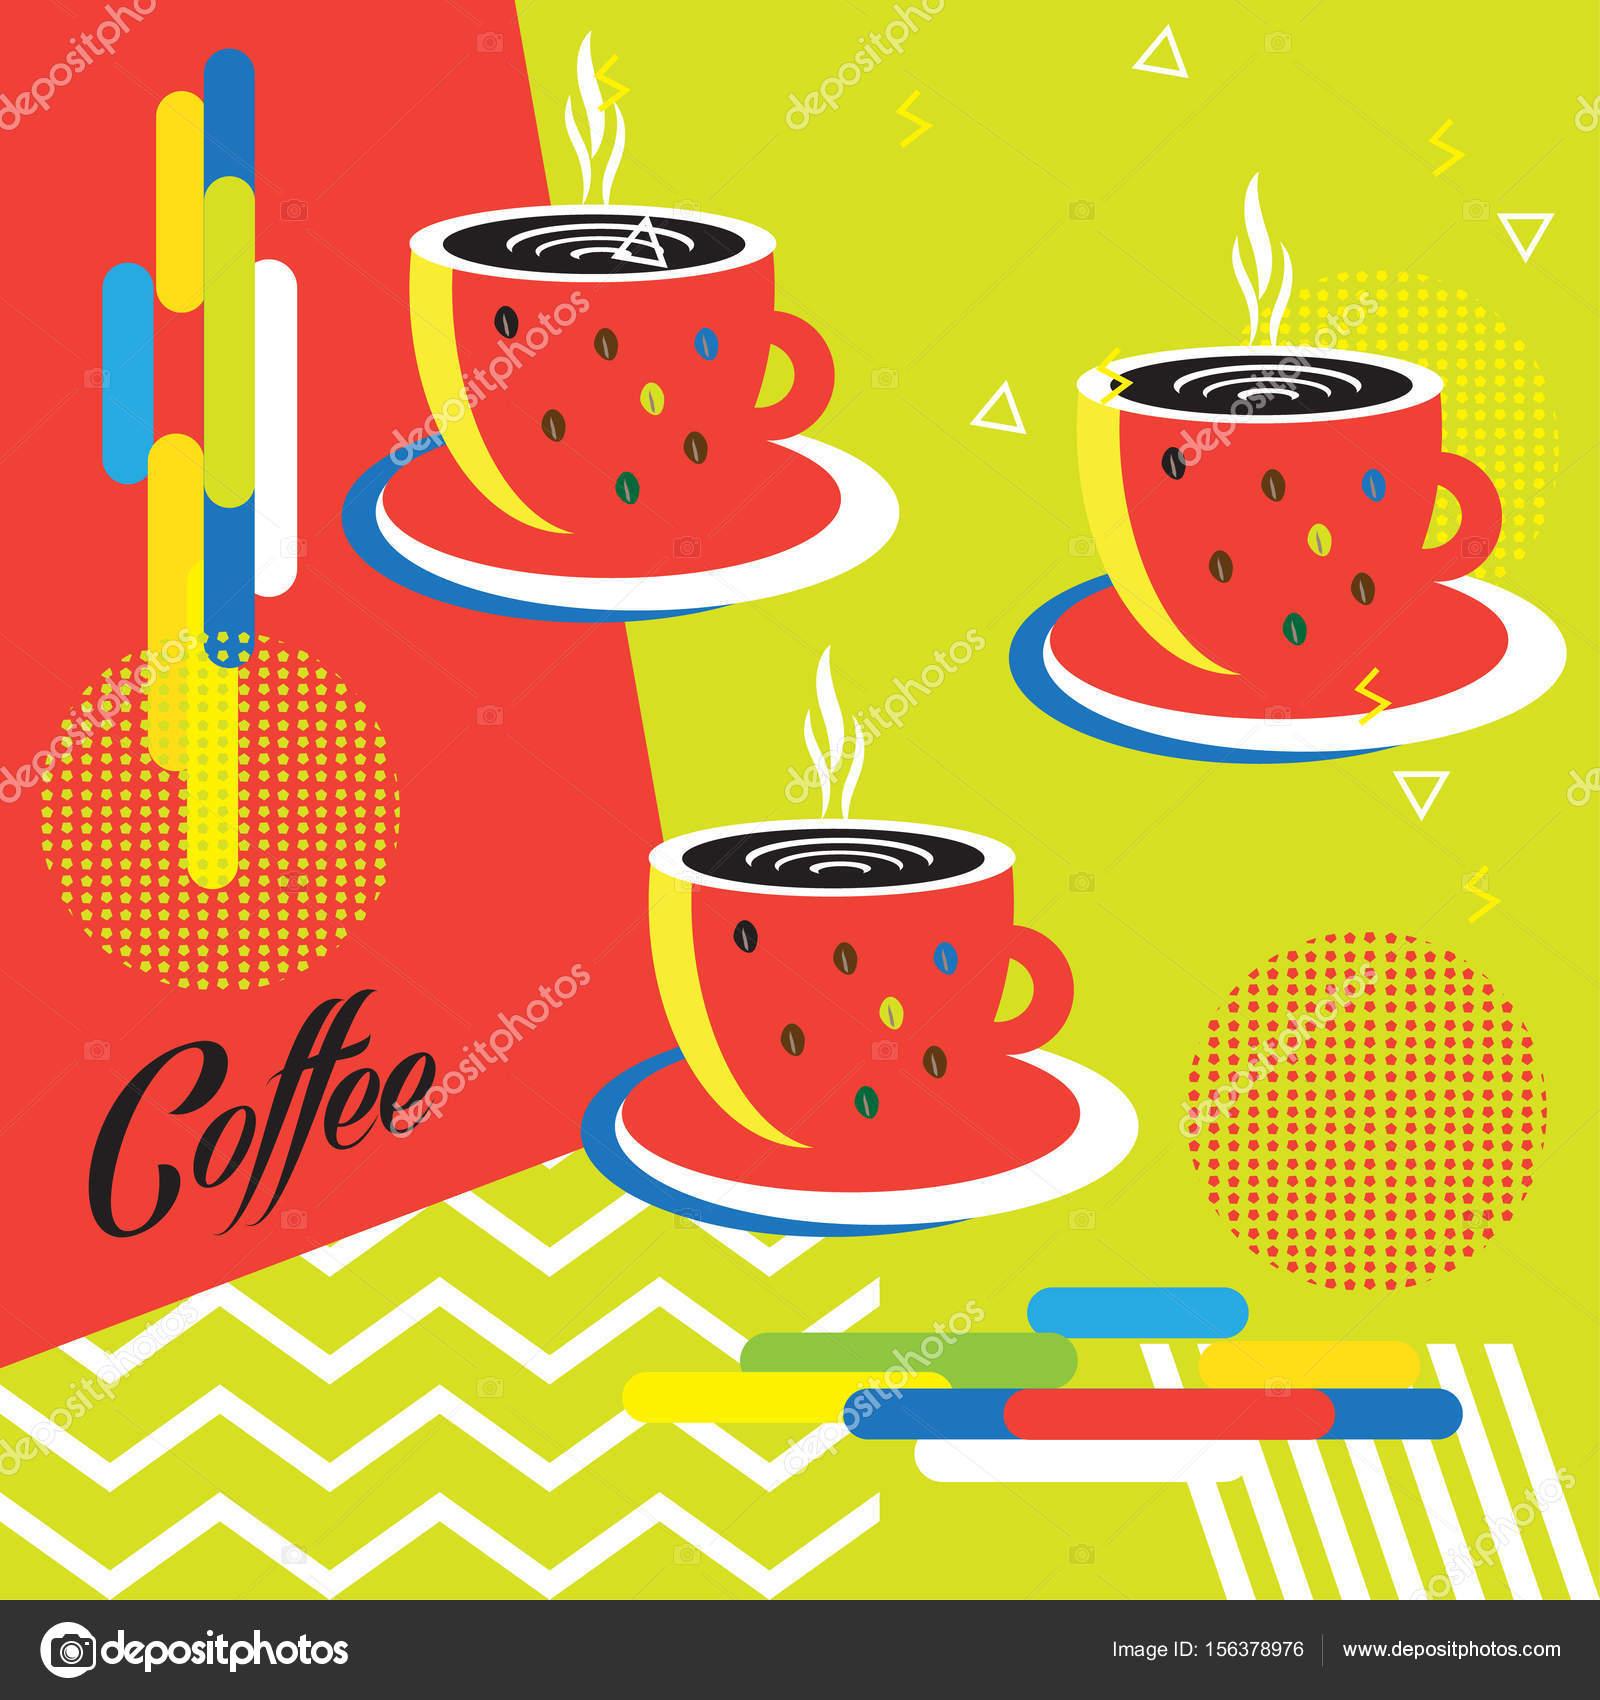 Art Modern Background Logo Menu Concept Illustration Template Advertising Design Futuristic Banner Wallpaper Poster Coffee Beans Tea Cafe Drinking